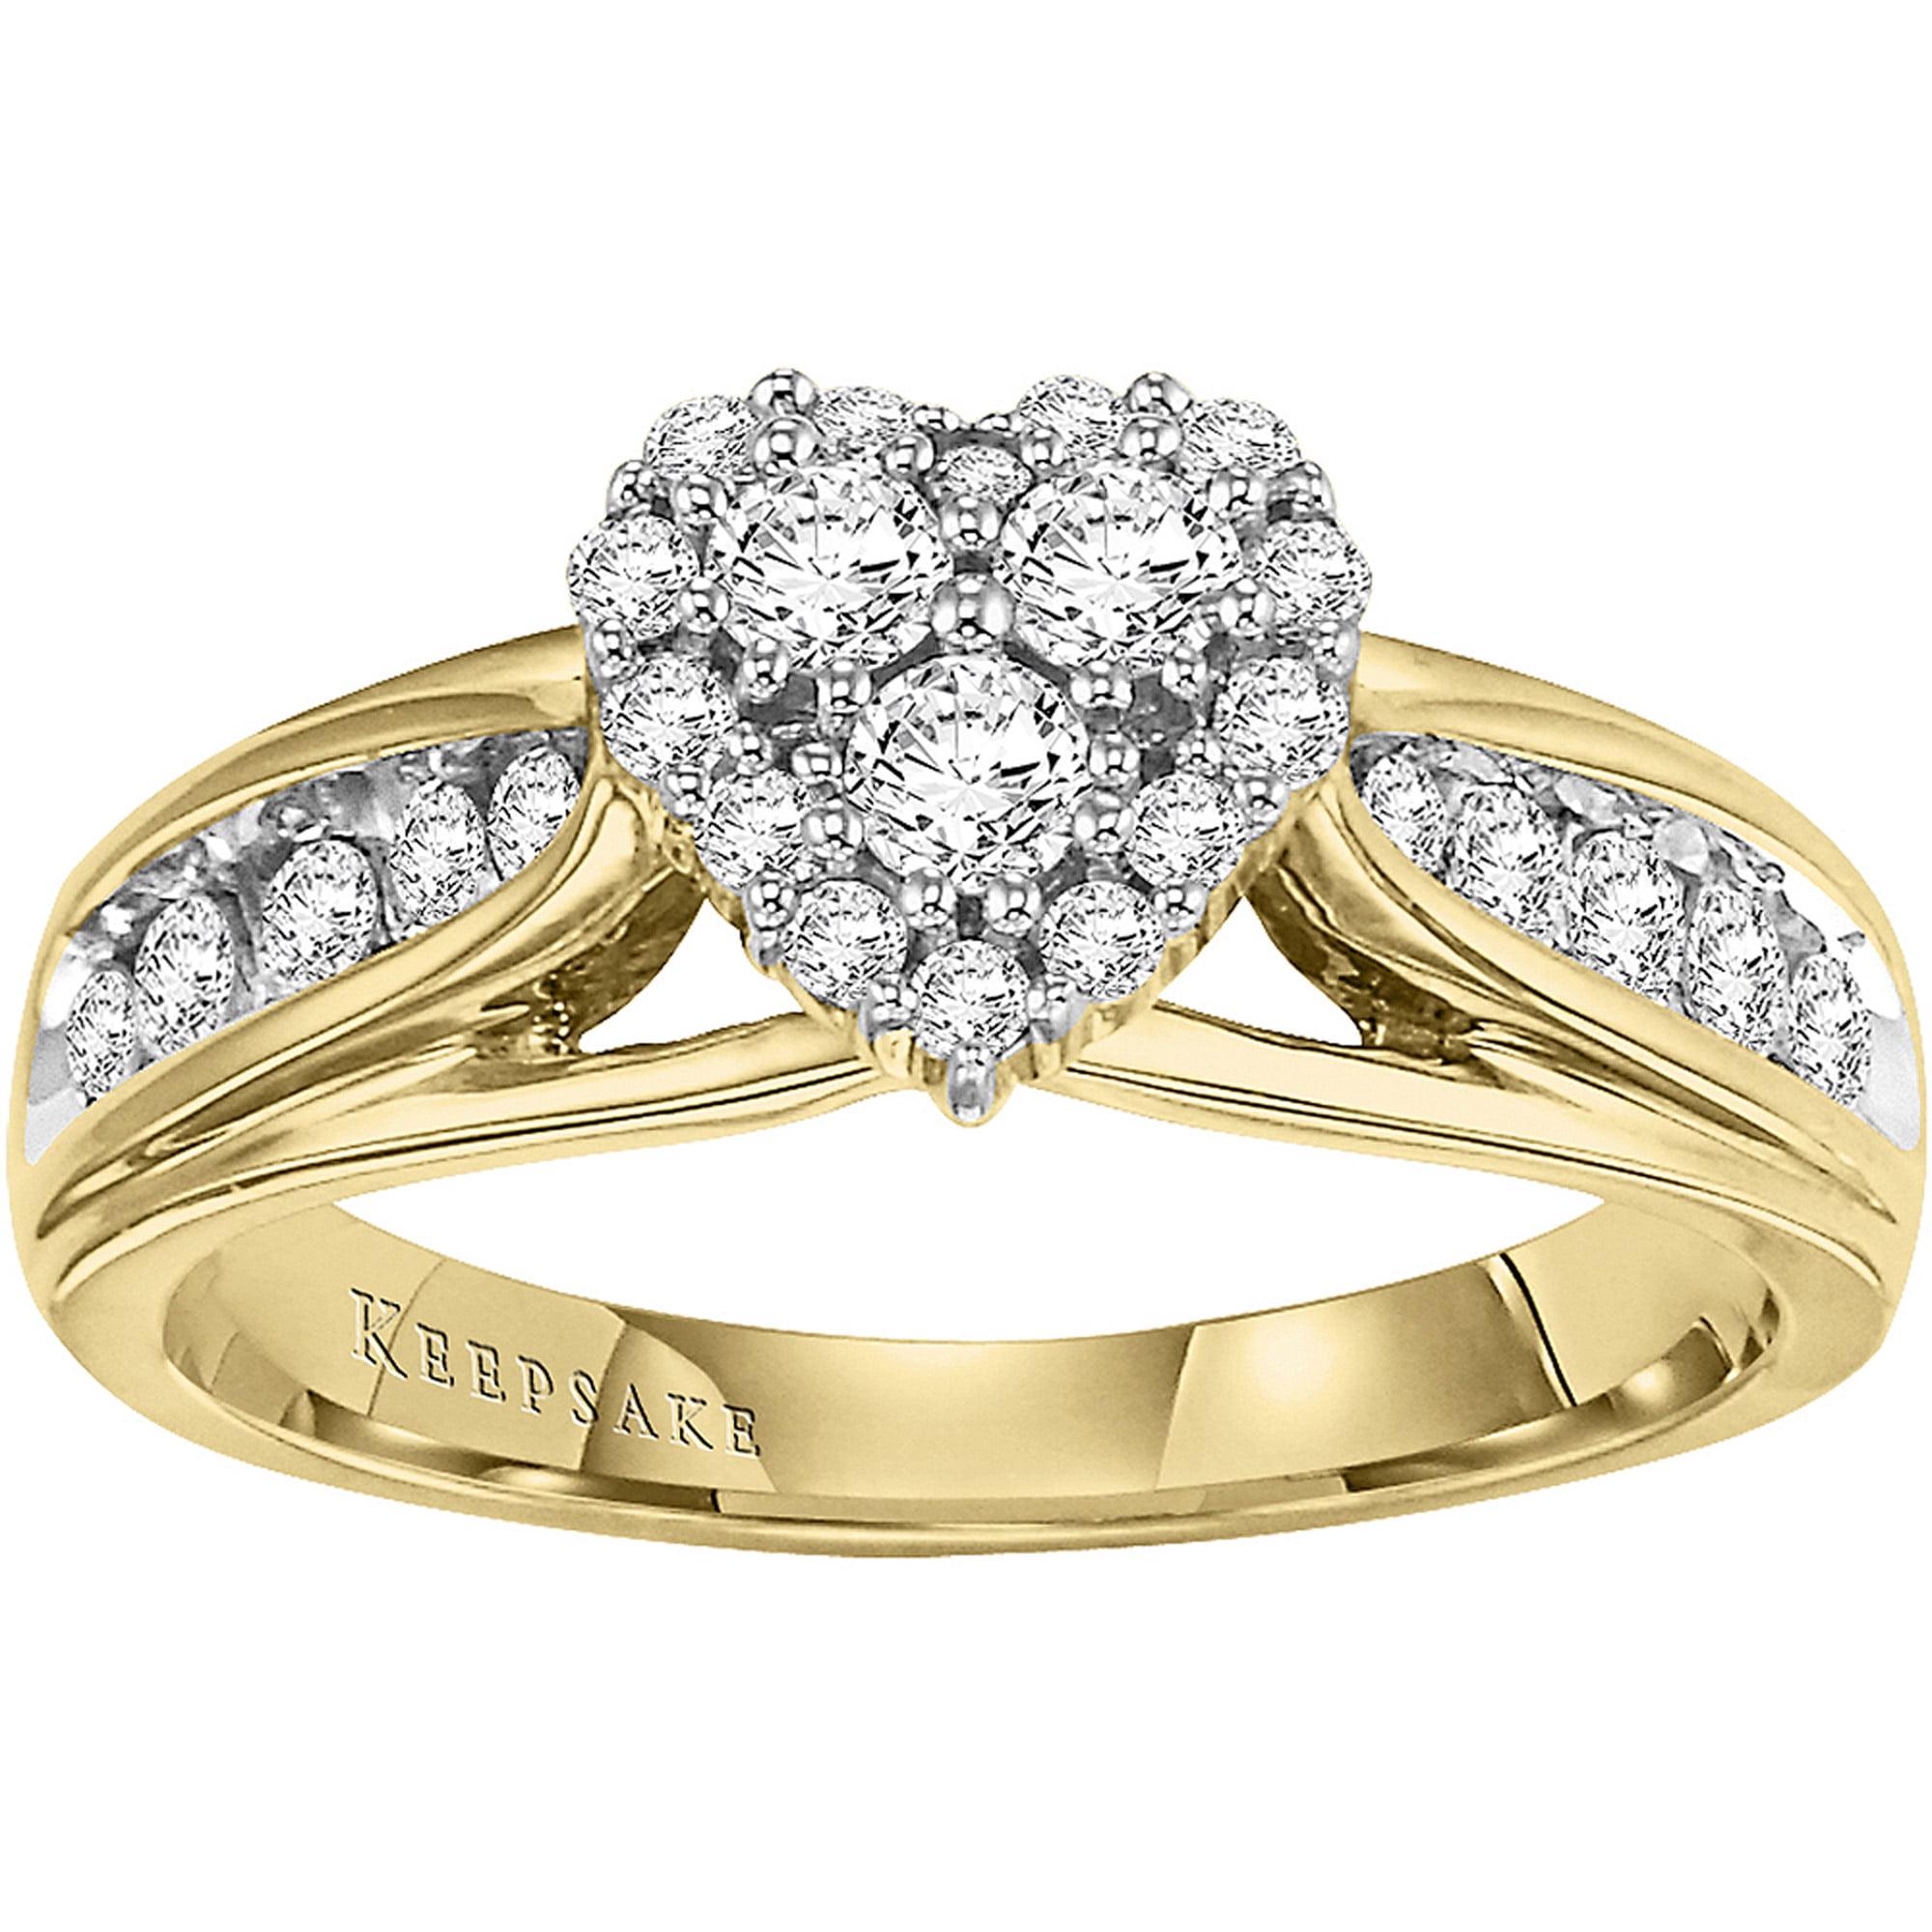 Keepsake Hearts Desire 1/2 Carat T.W. Certified Diamond 10kt Yellow Gold Engagement Ring